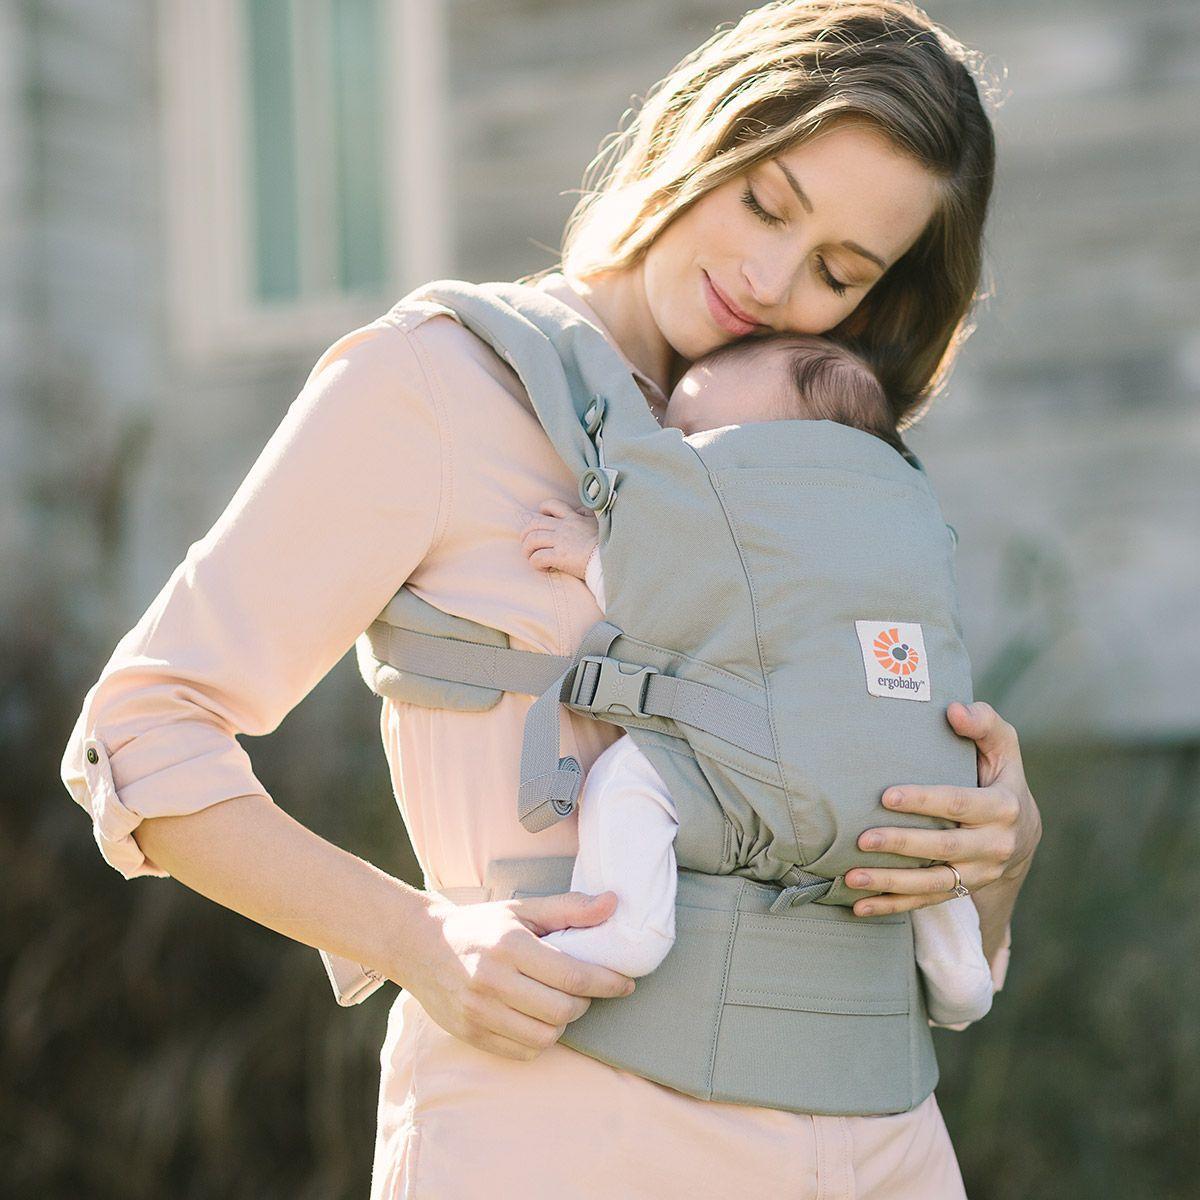 New ergo baby carrier 2016 review balkan pharmaceuticals